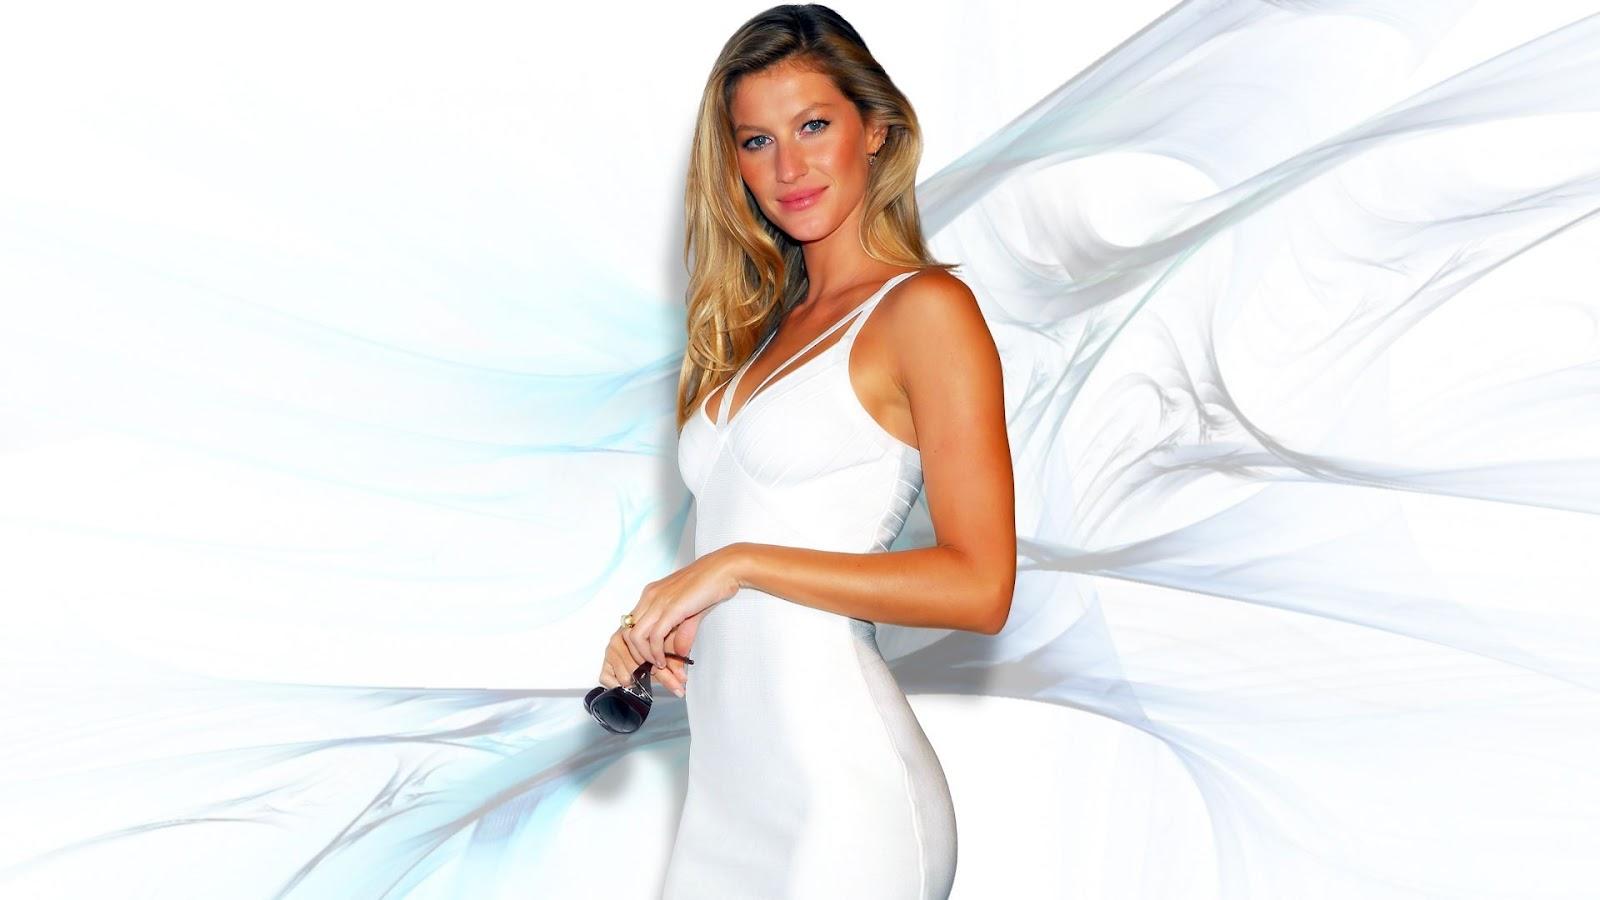 Gisele Bundchen Brazilian fashion Model - Highest Pixx Gisele Bundchen Wiki